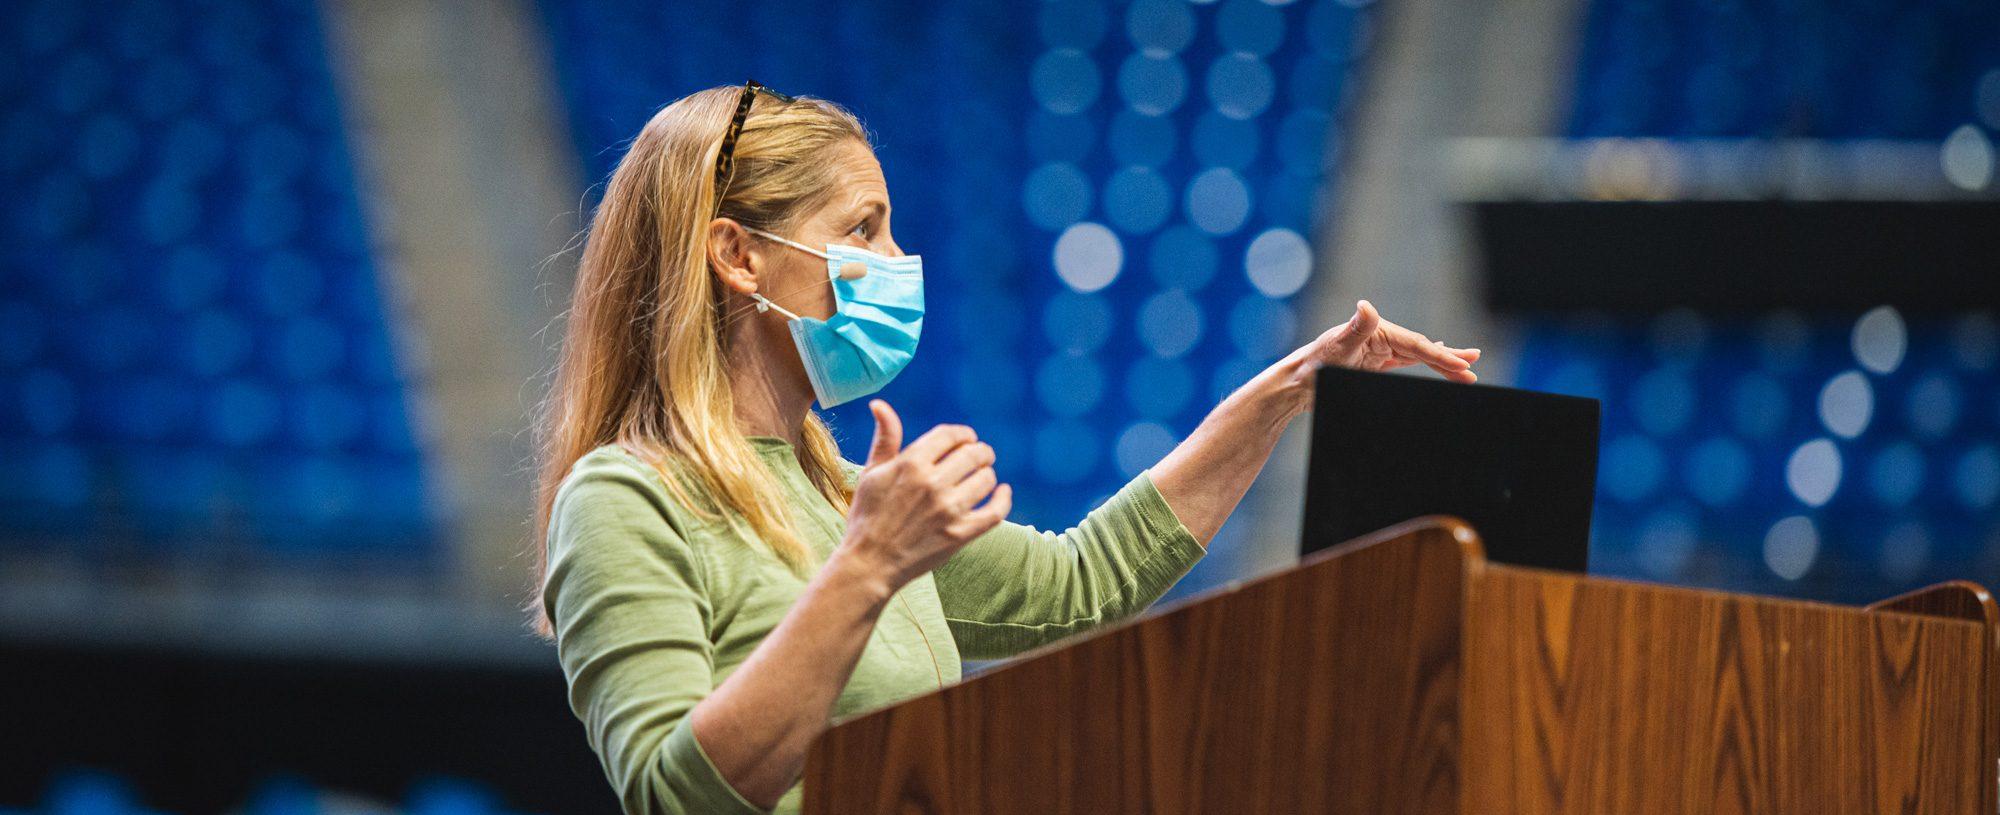 Instructor wearing mask at podium